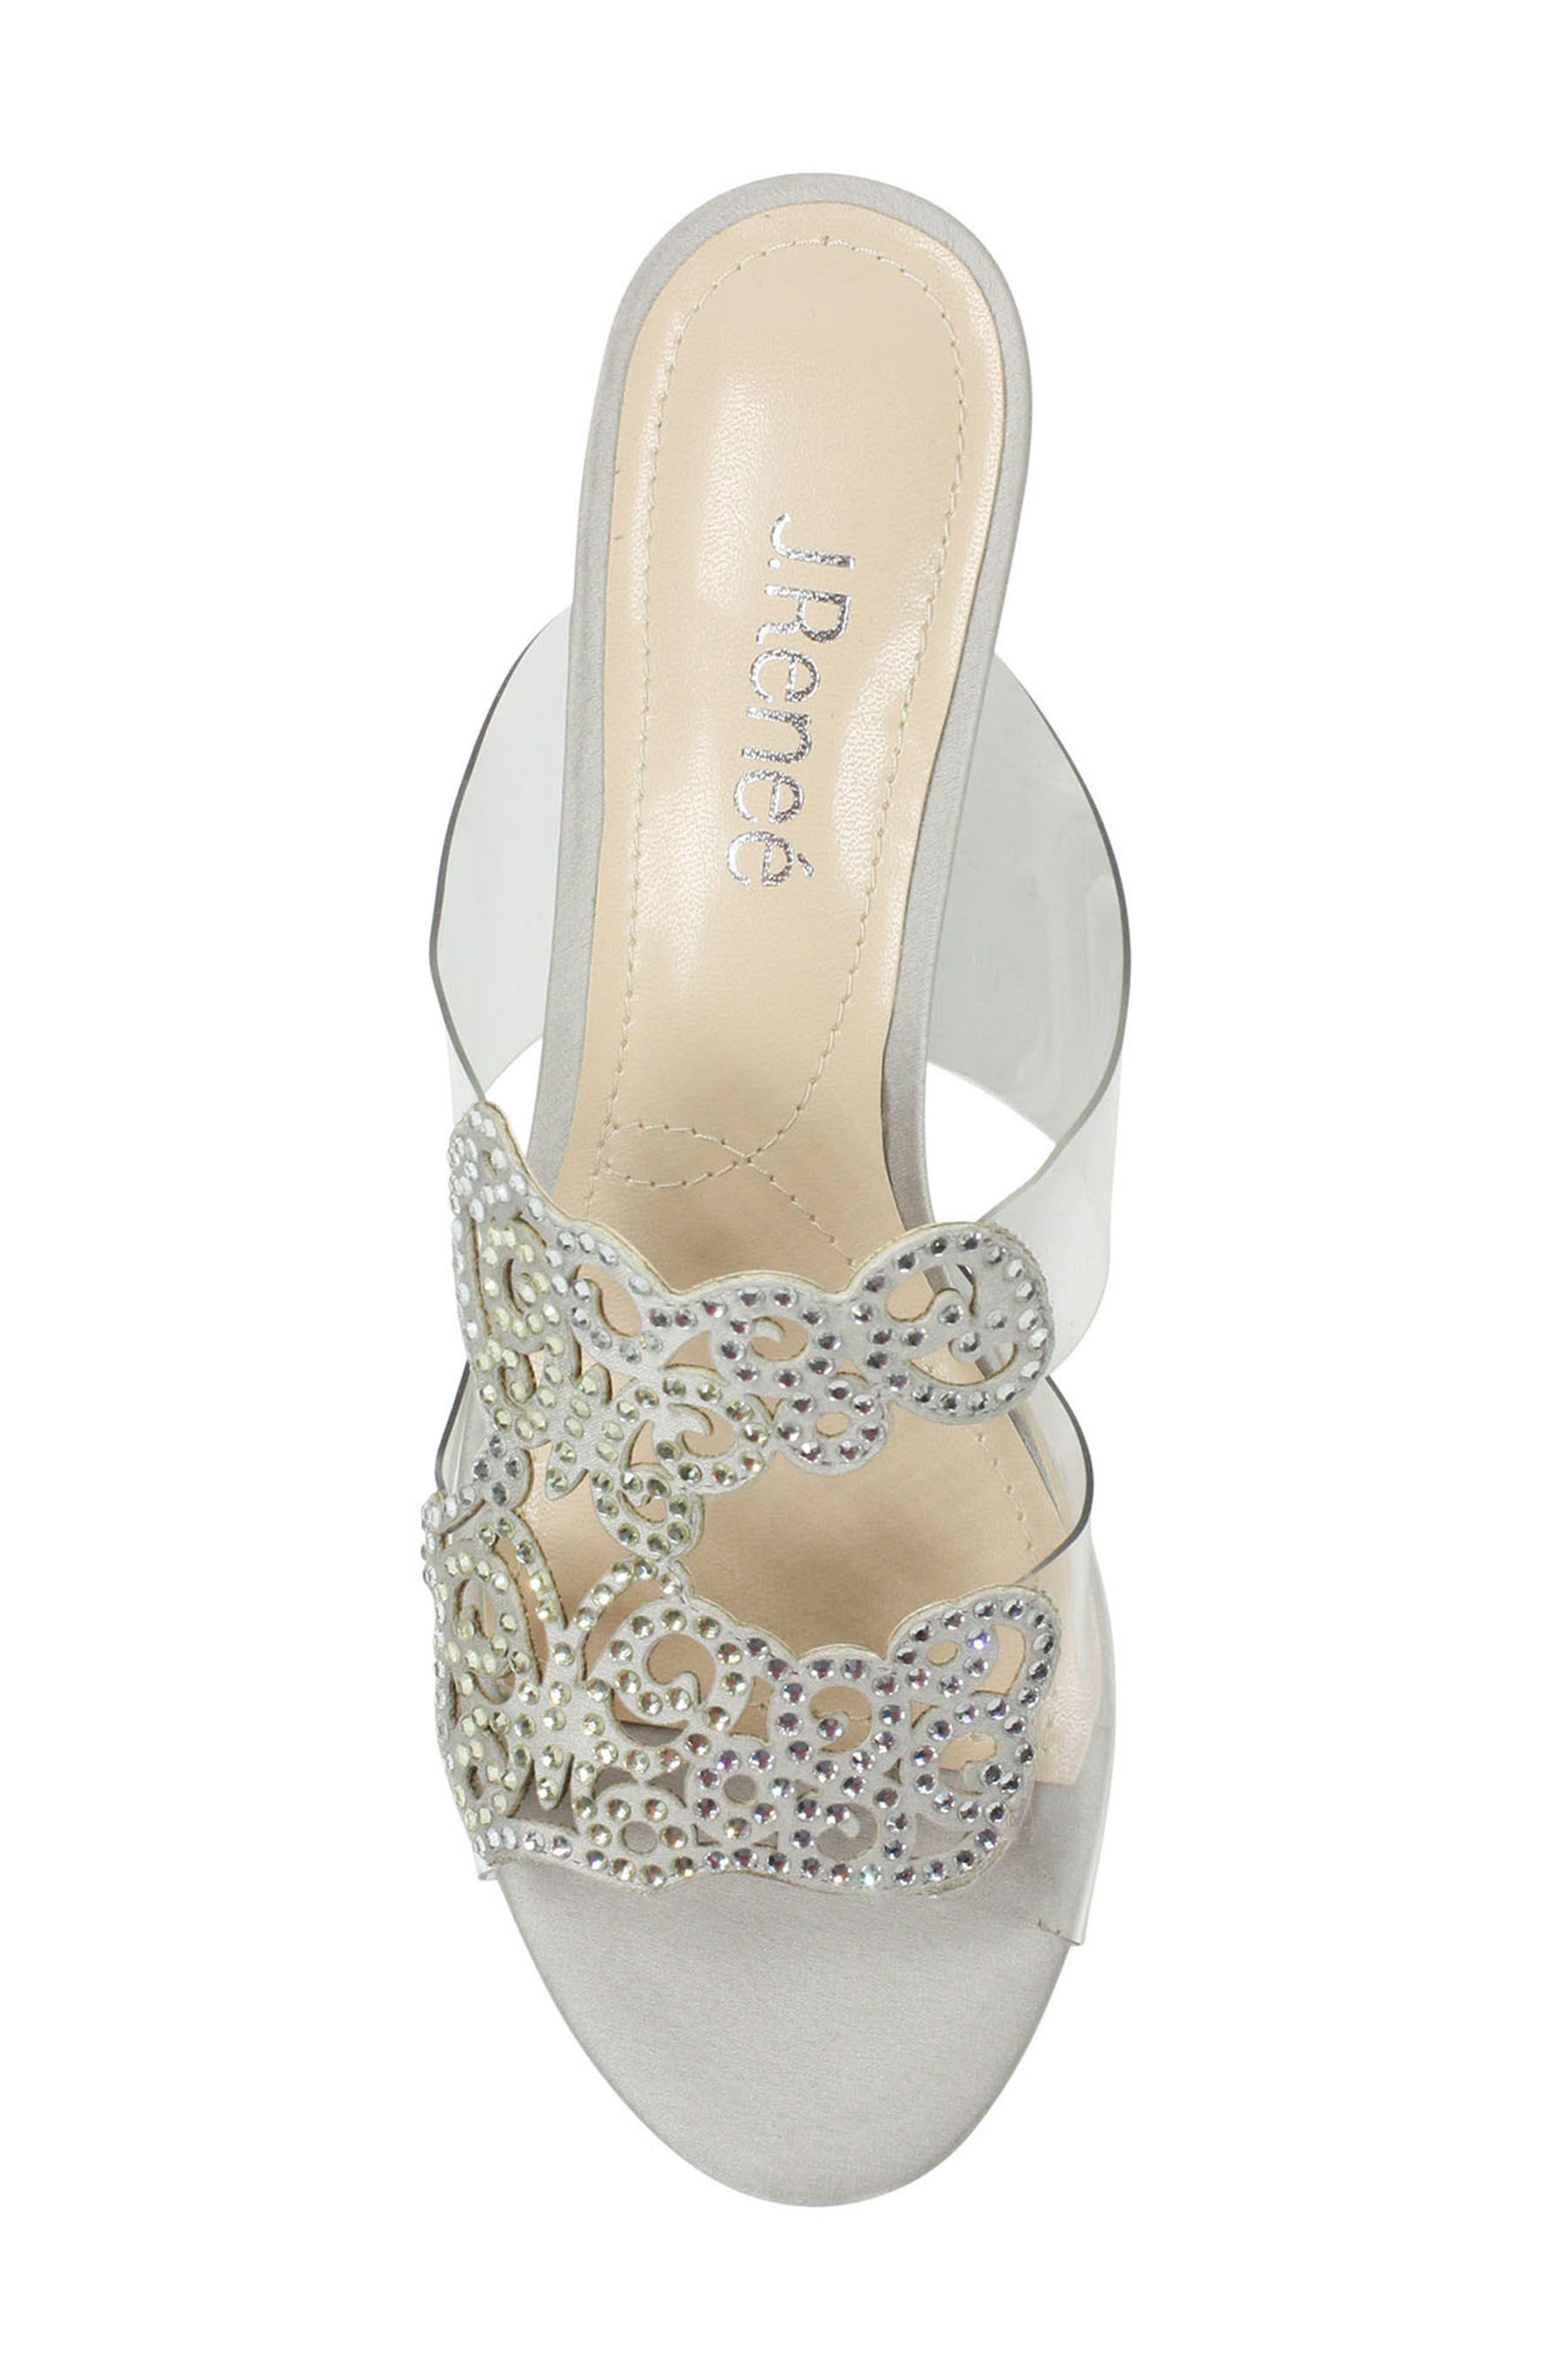 Sabreen Crystal Embellished Sandal,                             Alternate thumbnail 5, color,                             SILVER/ CLEAR